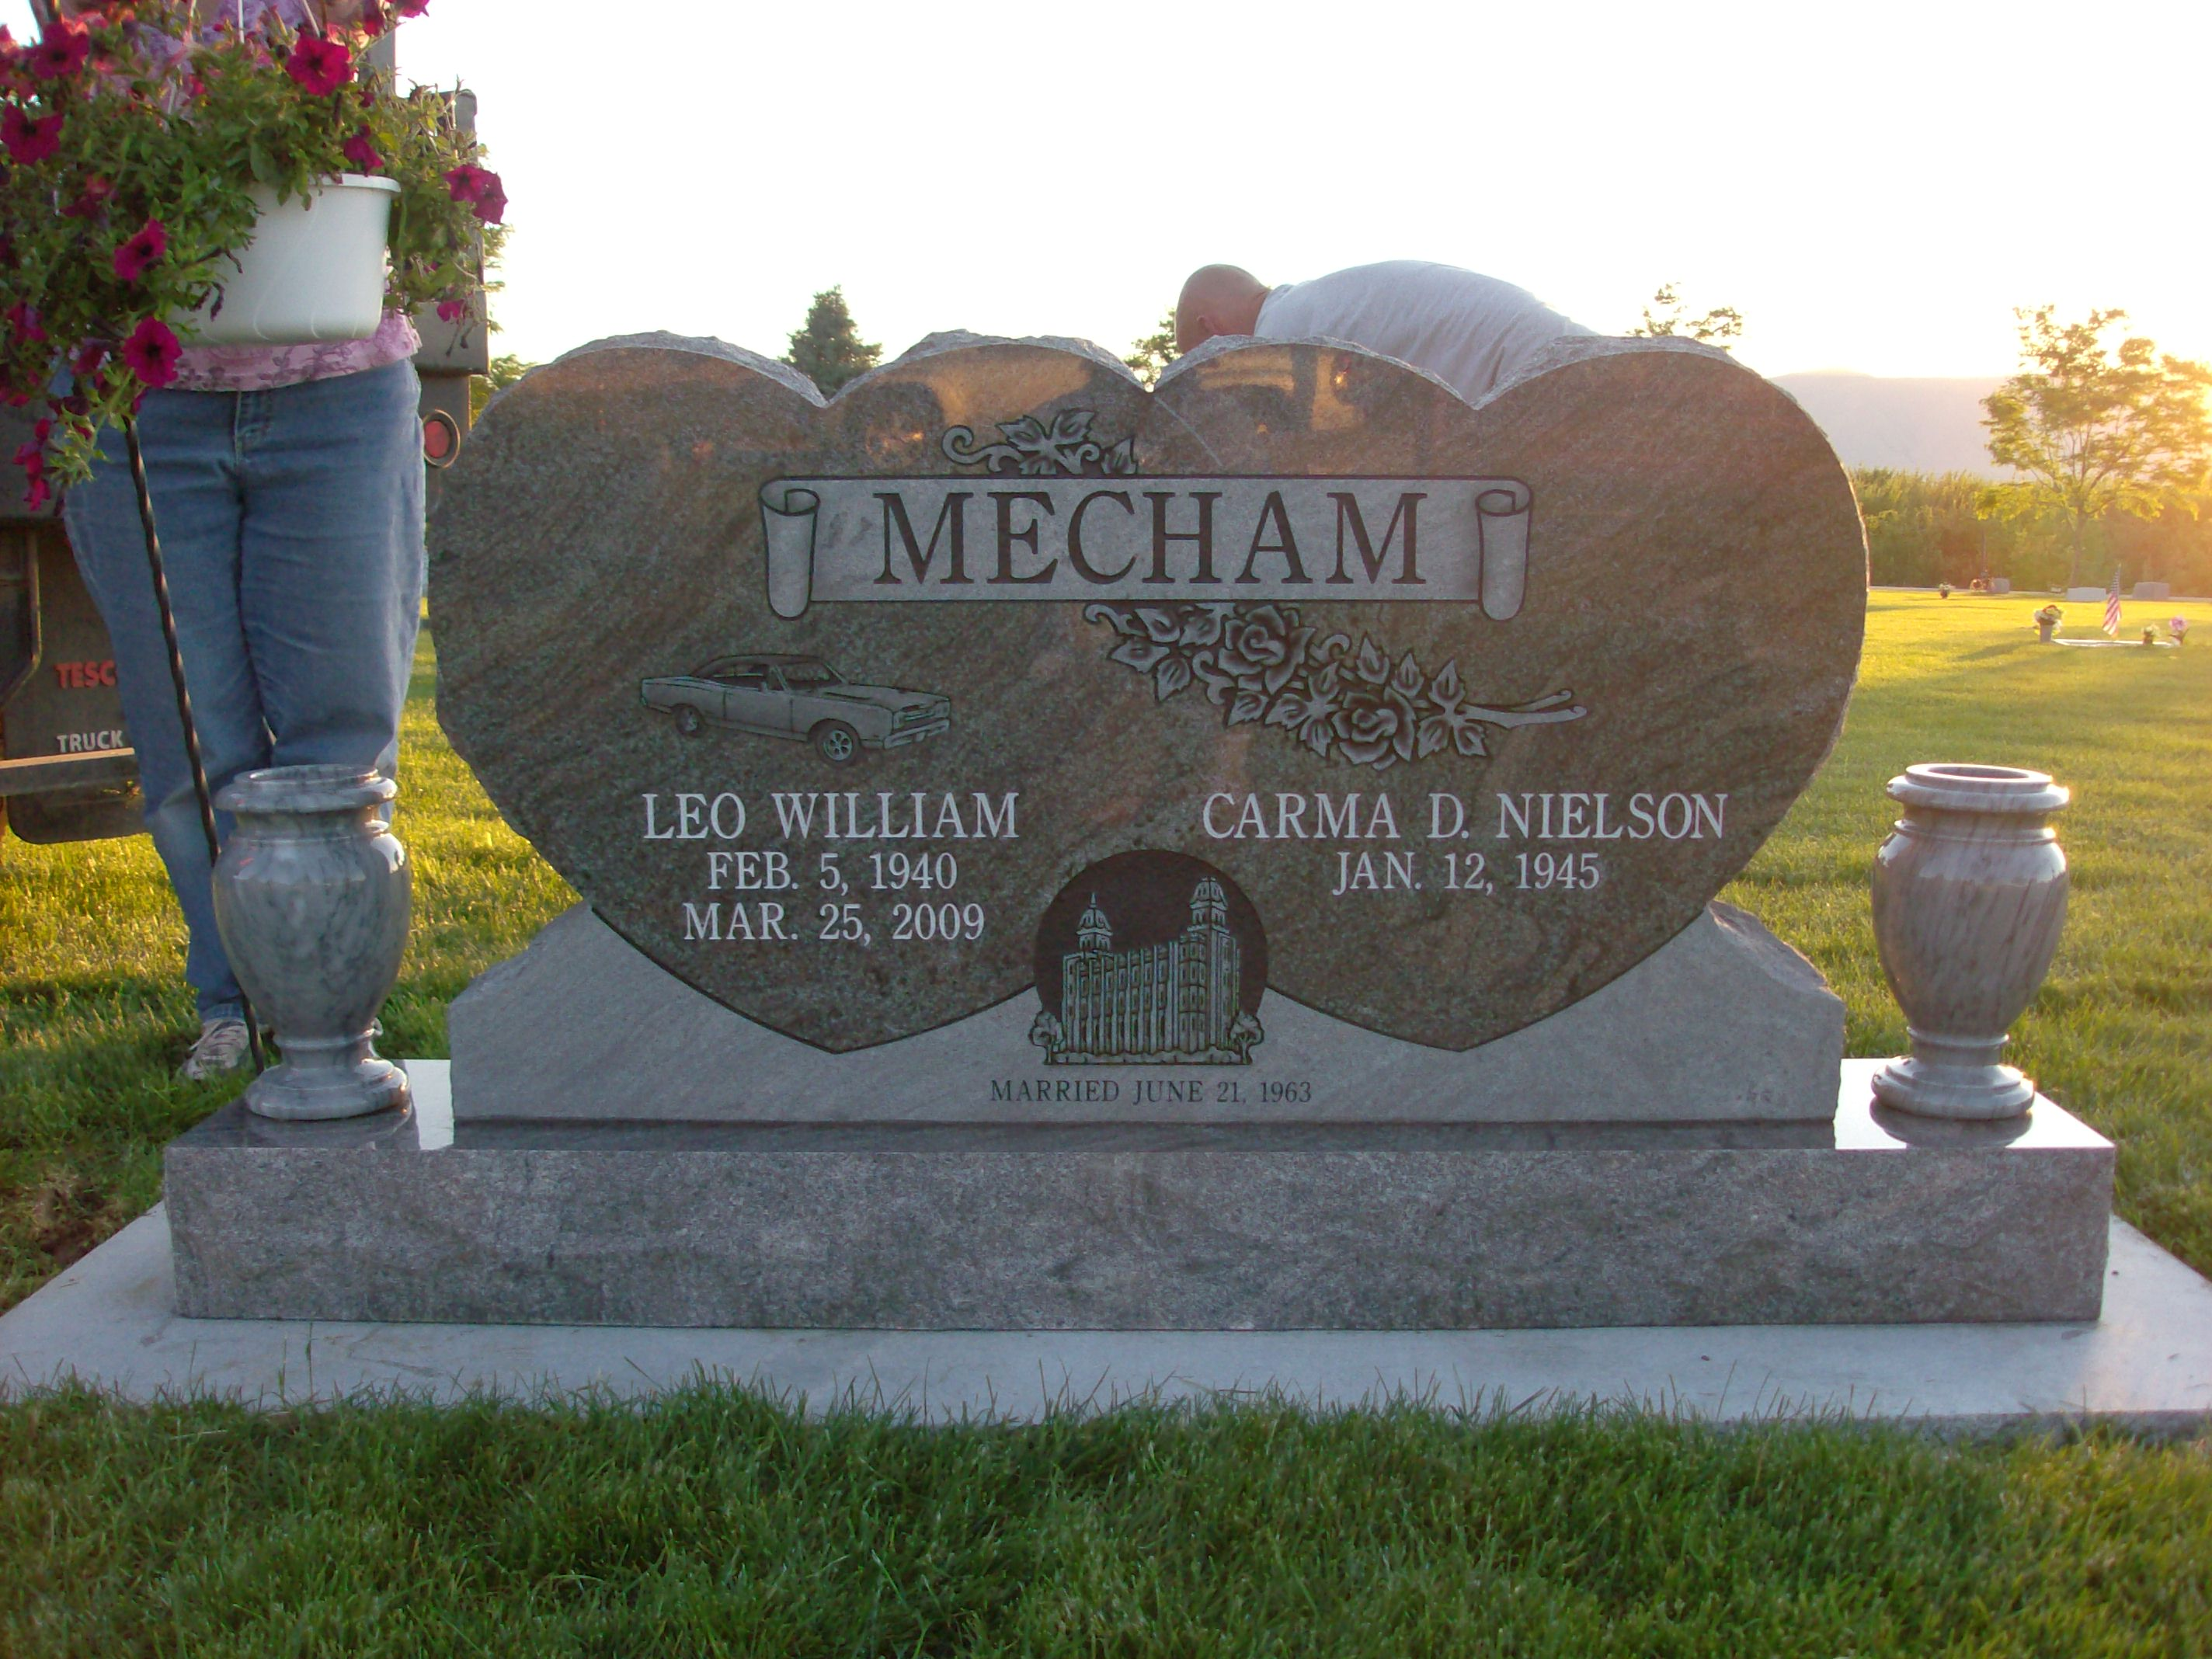 Mecham